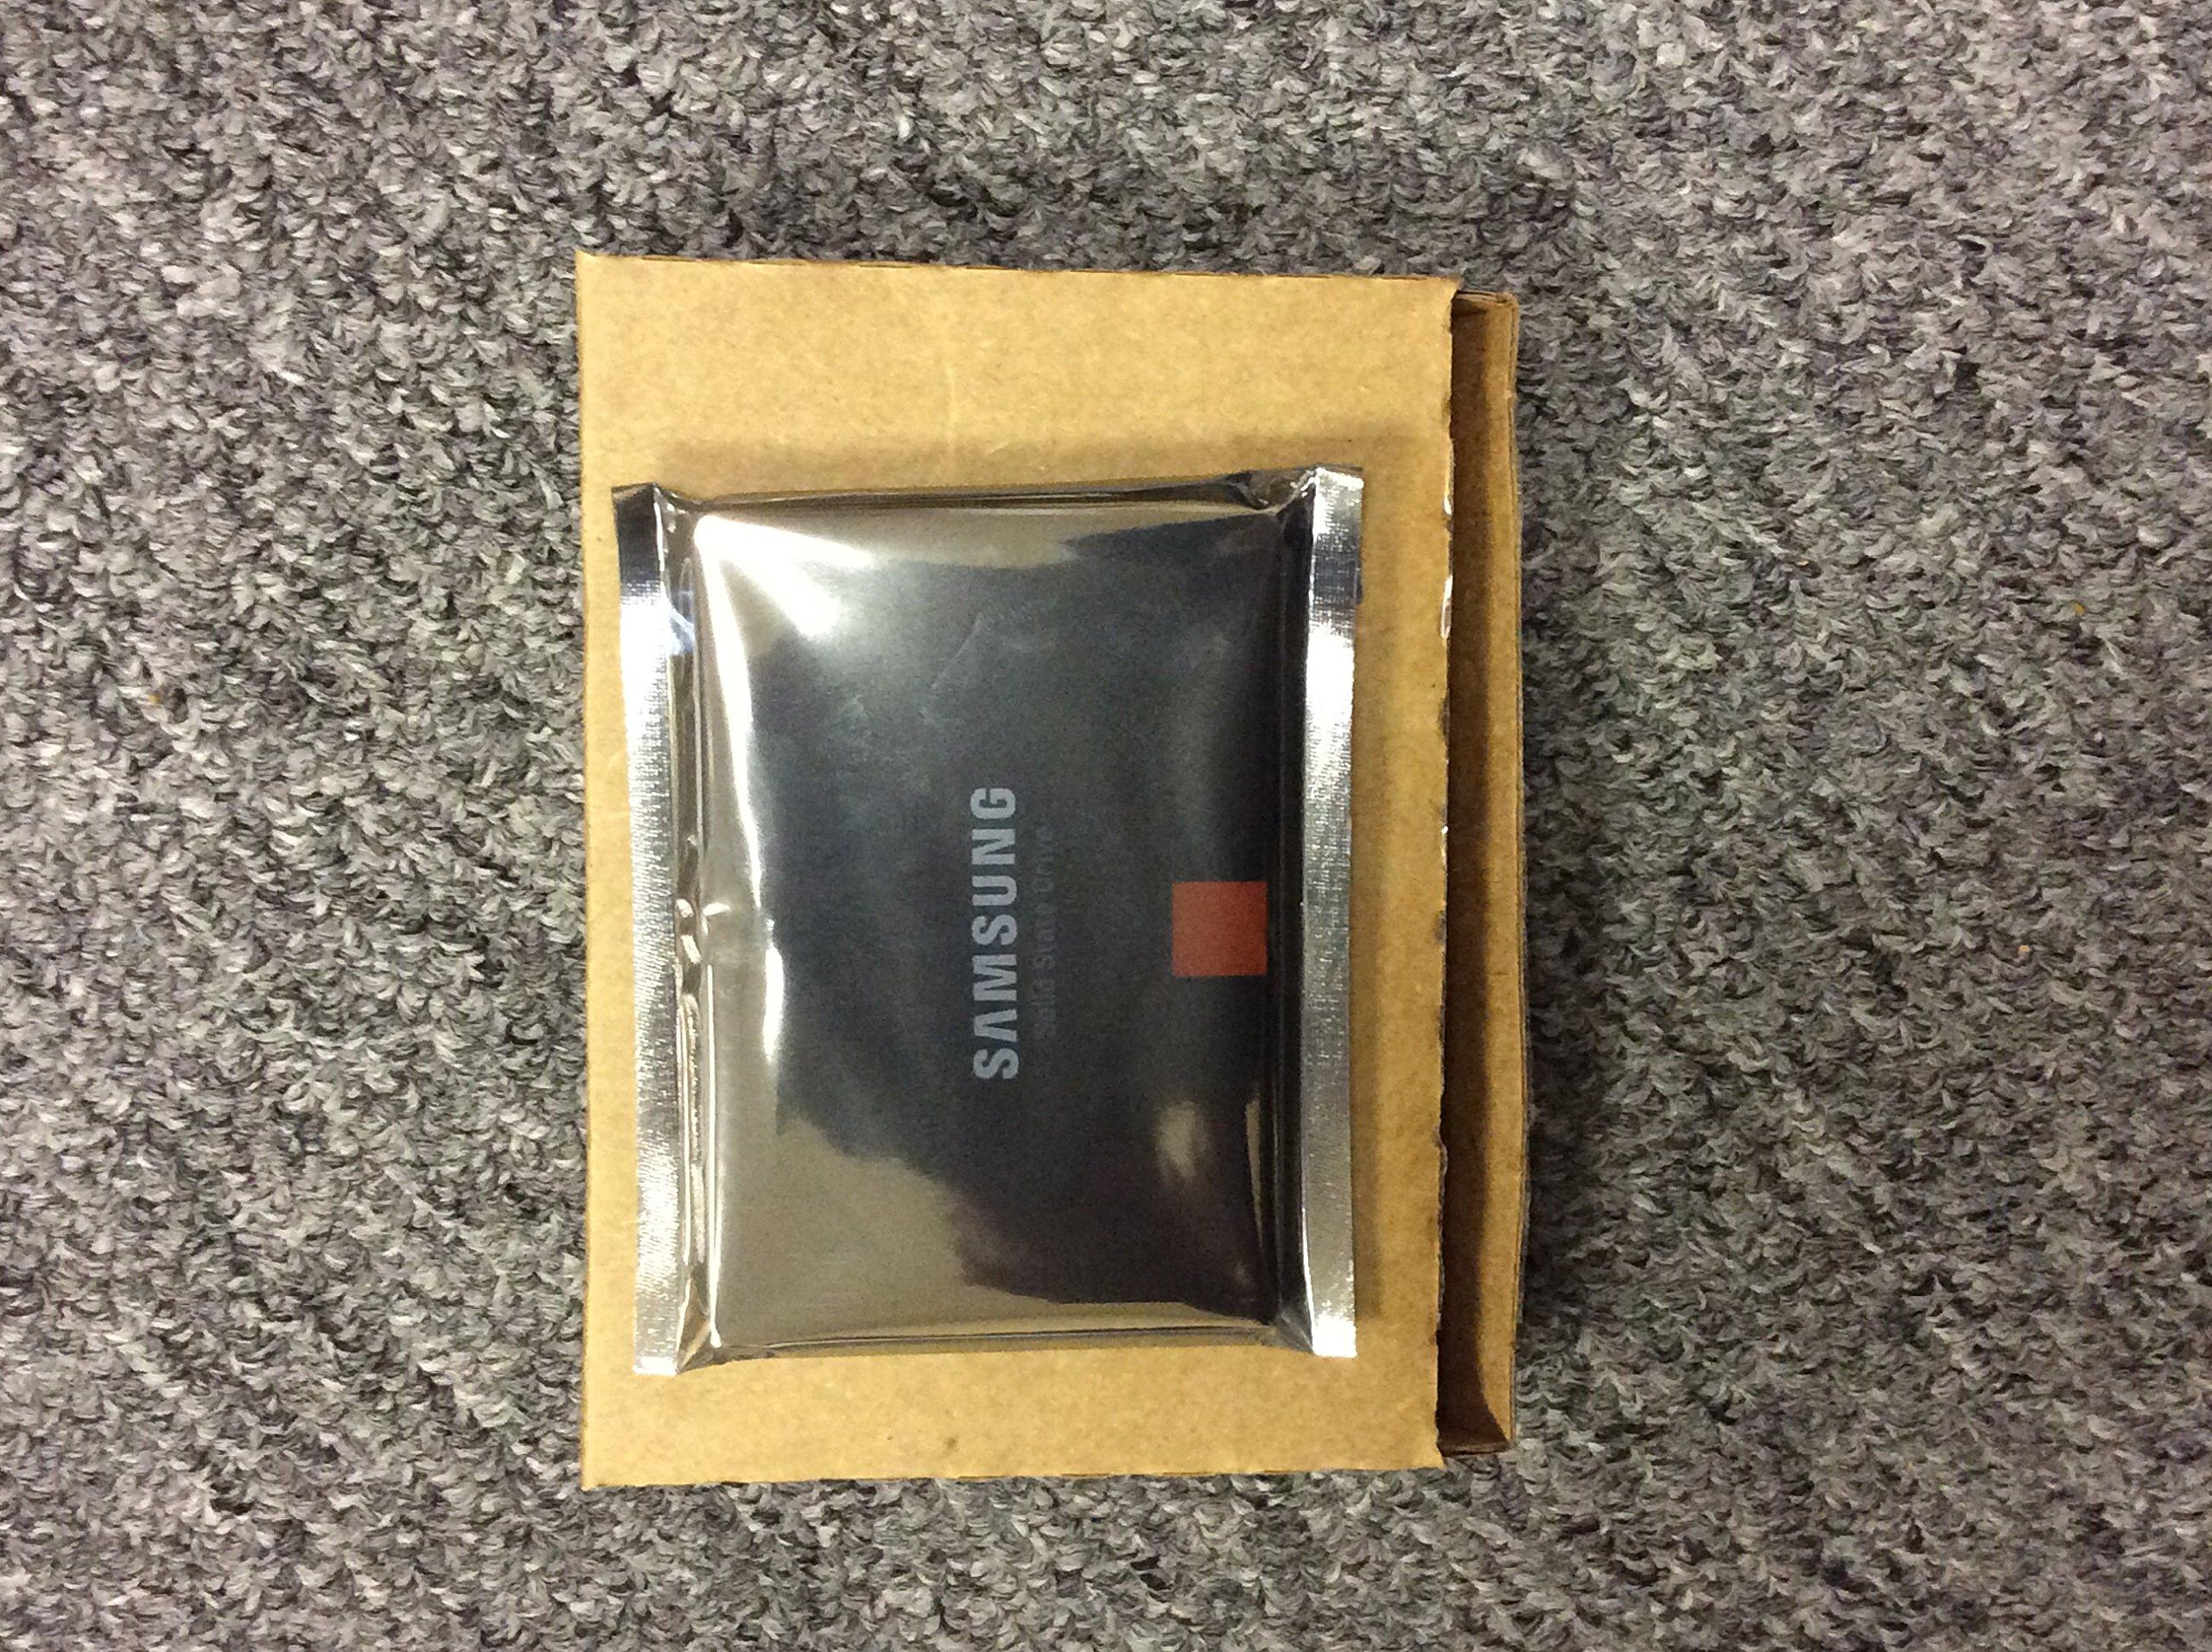 Samsung 128GB SSD MZ-7PD128M 2.5'' SATA 6Gb/s Solid State Drive MZ7PD128HCFV-000H1